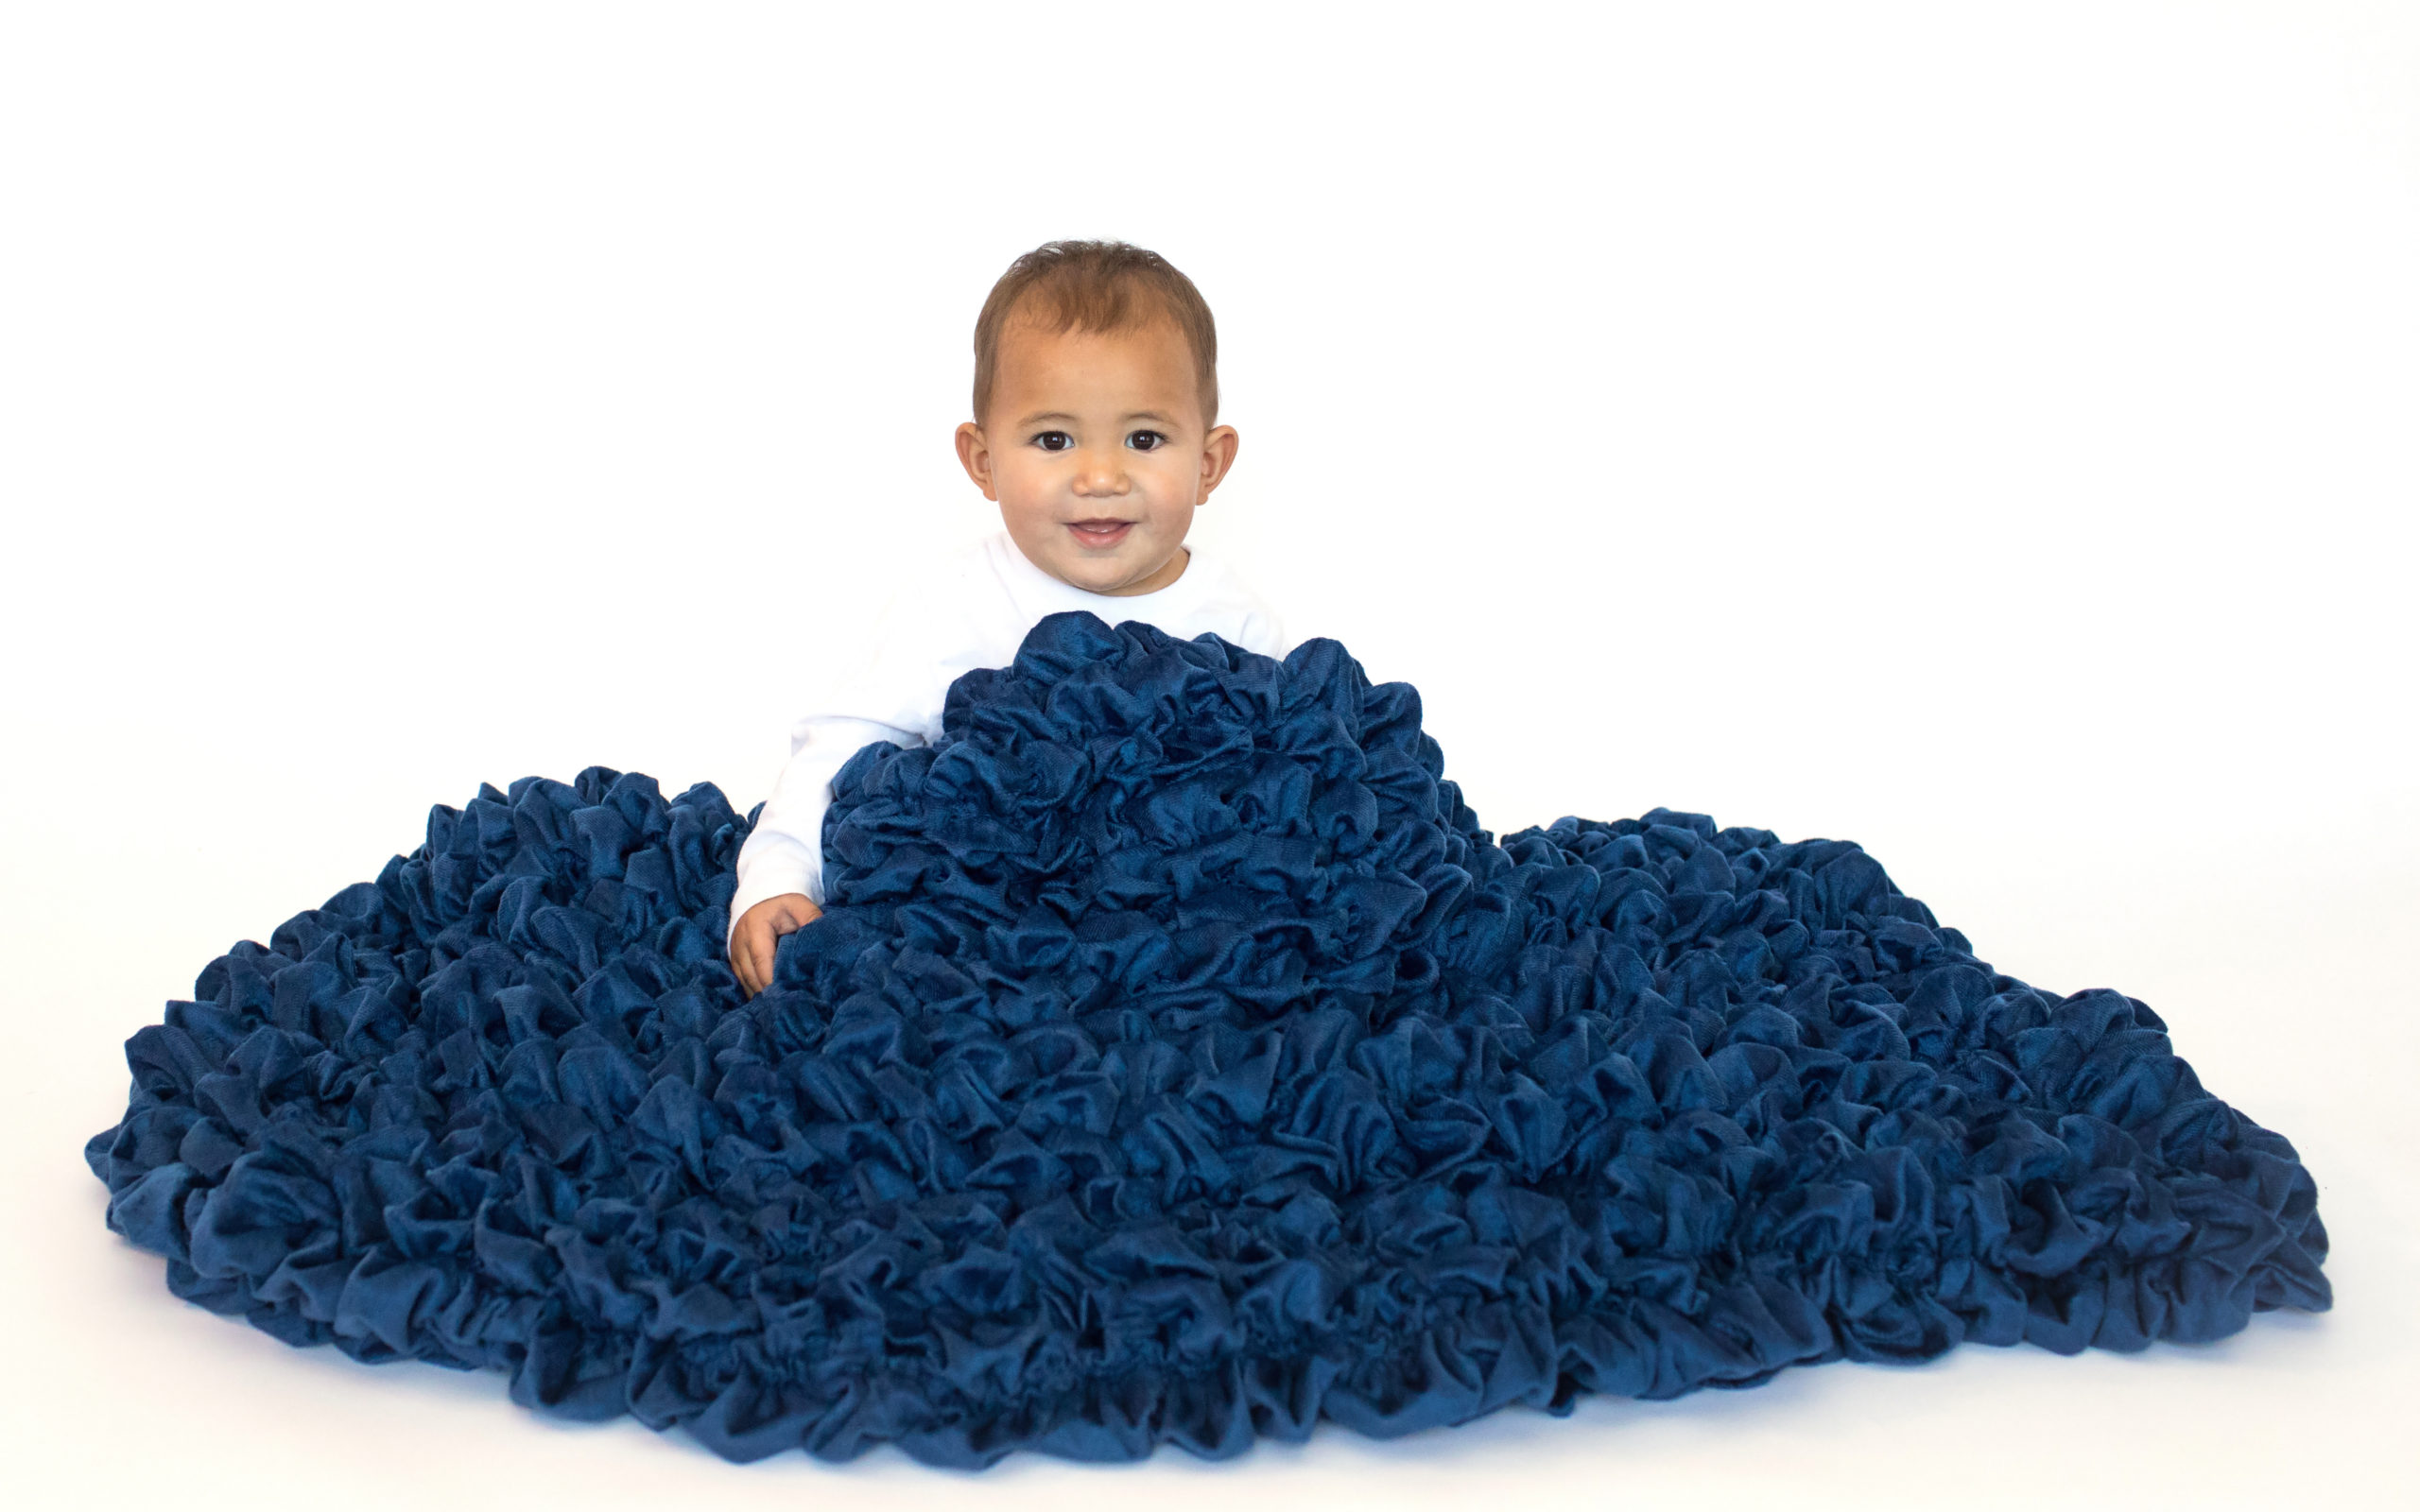 Navy blue high end crib blanket